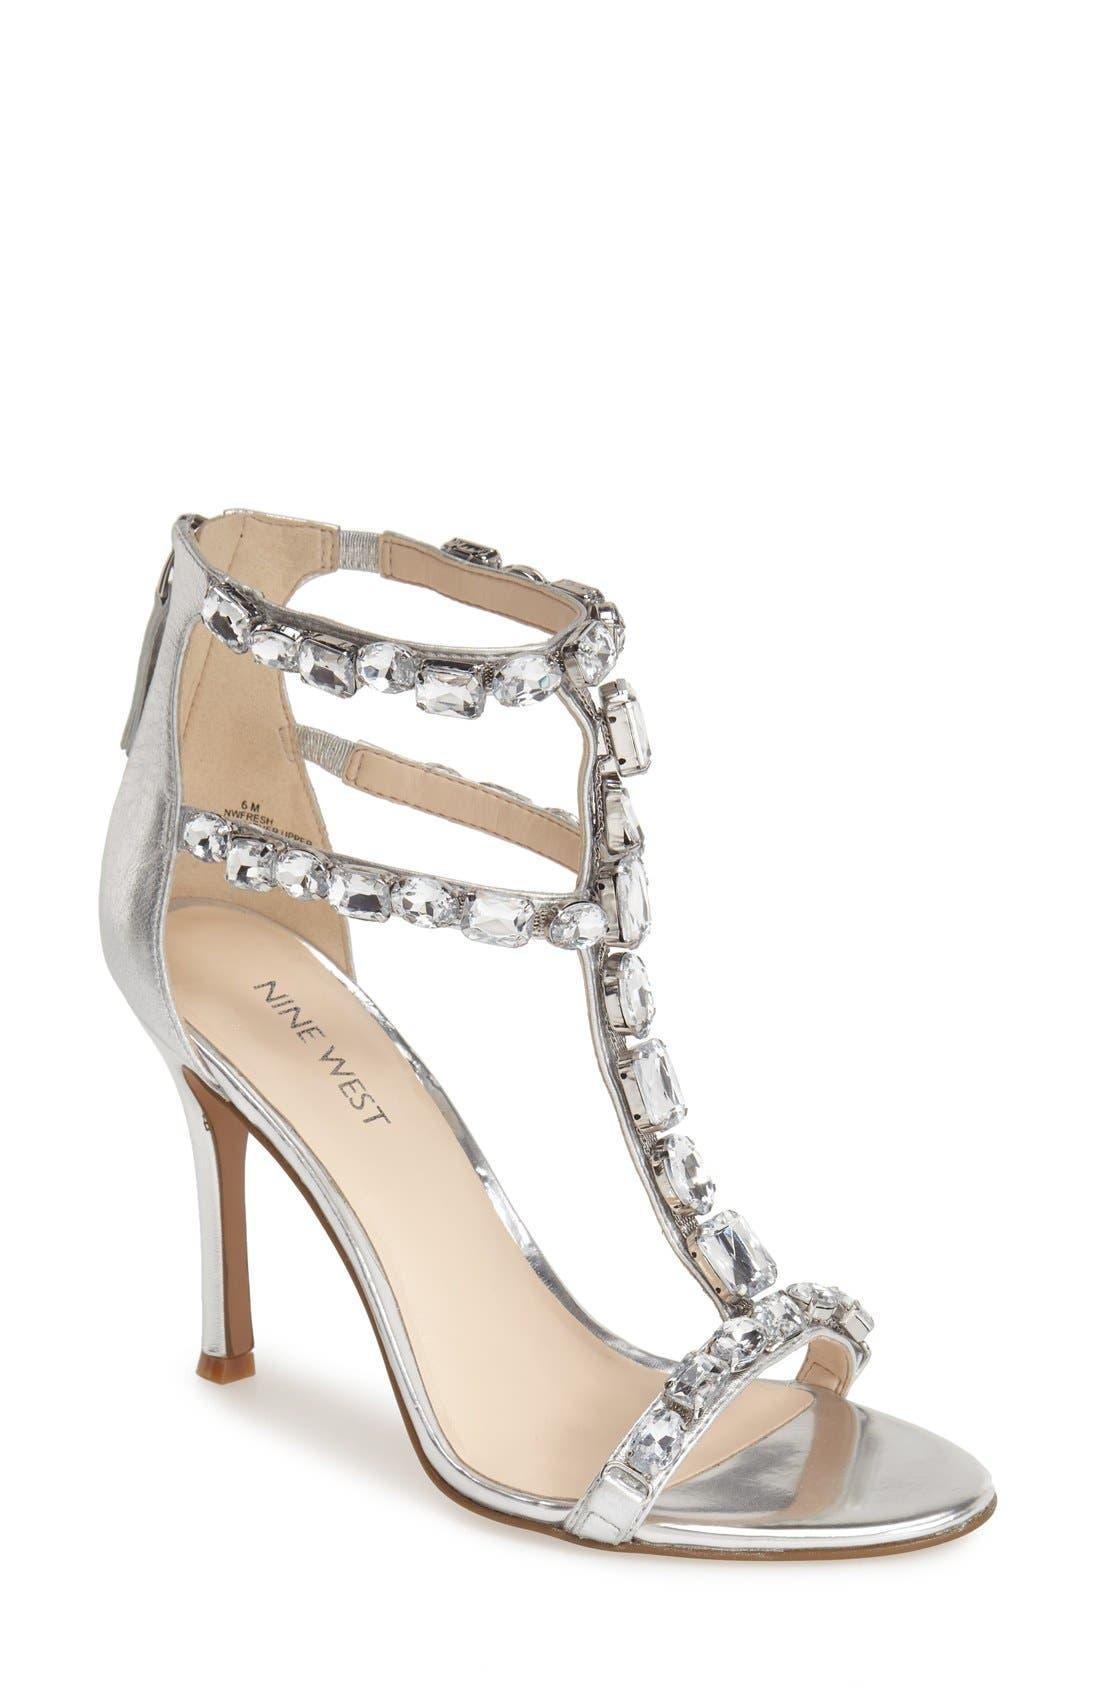 Alternate Image 1 Selected - Nine West 'Fresh' Crystal T-Strap Sandal (Women)